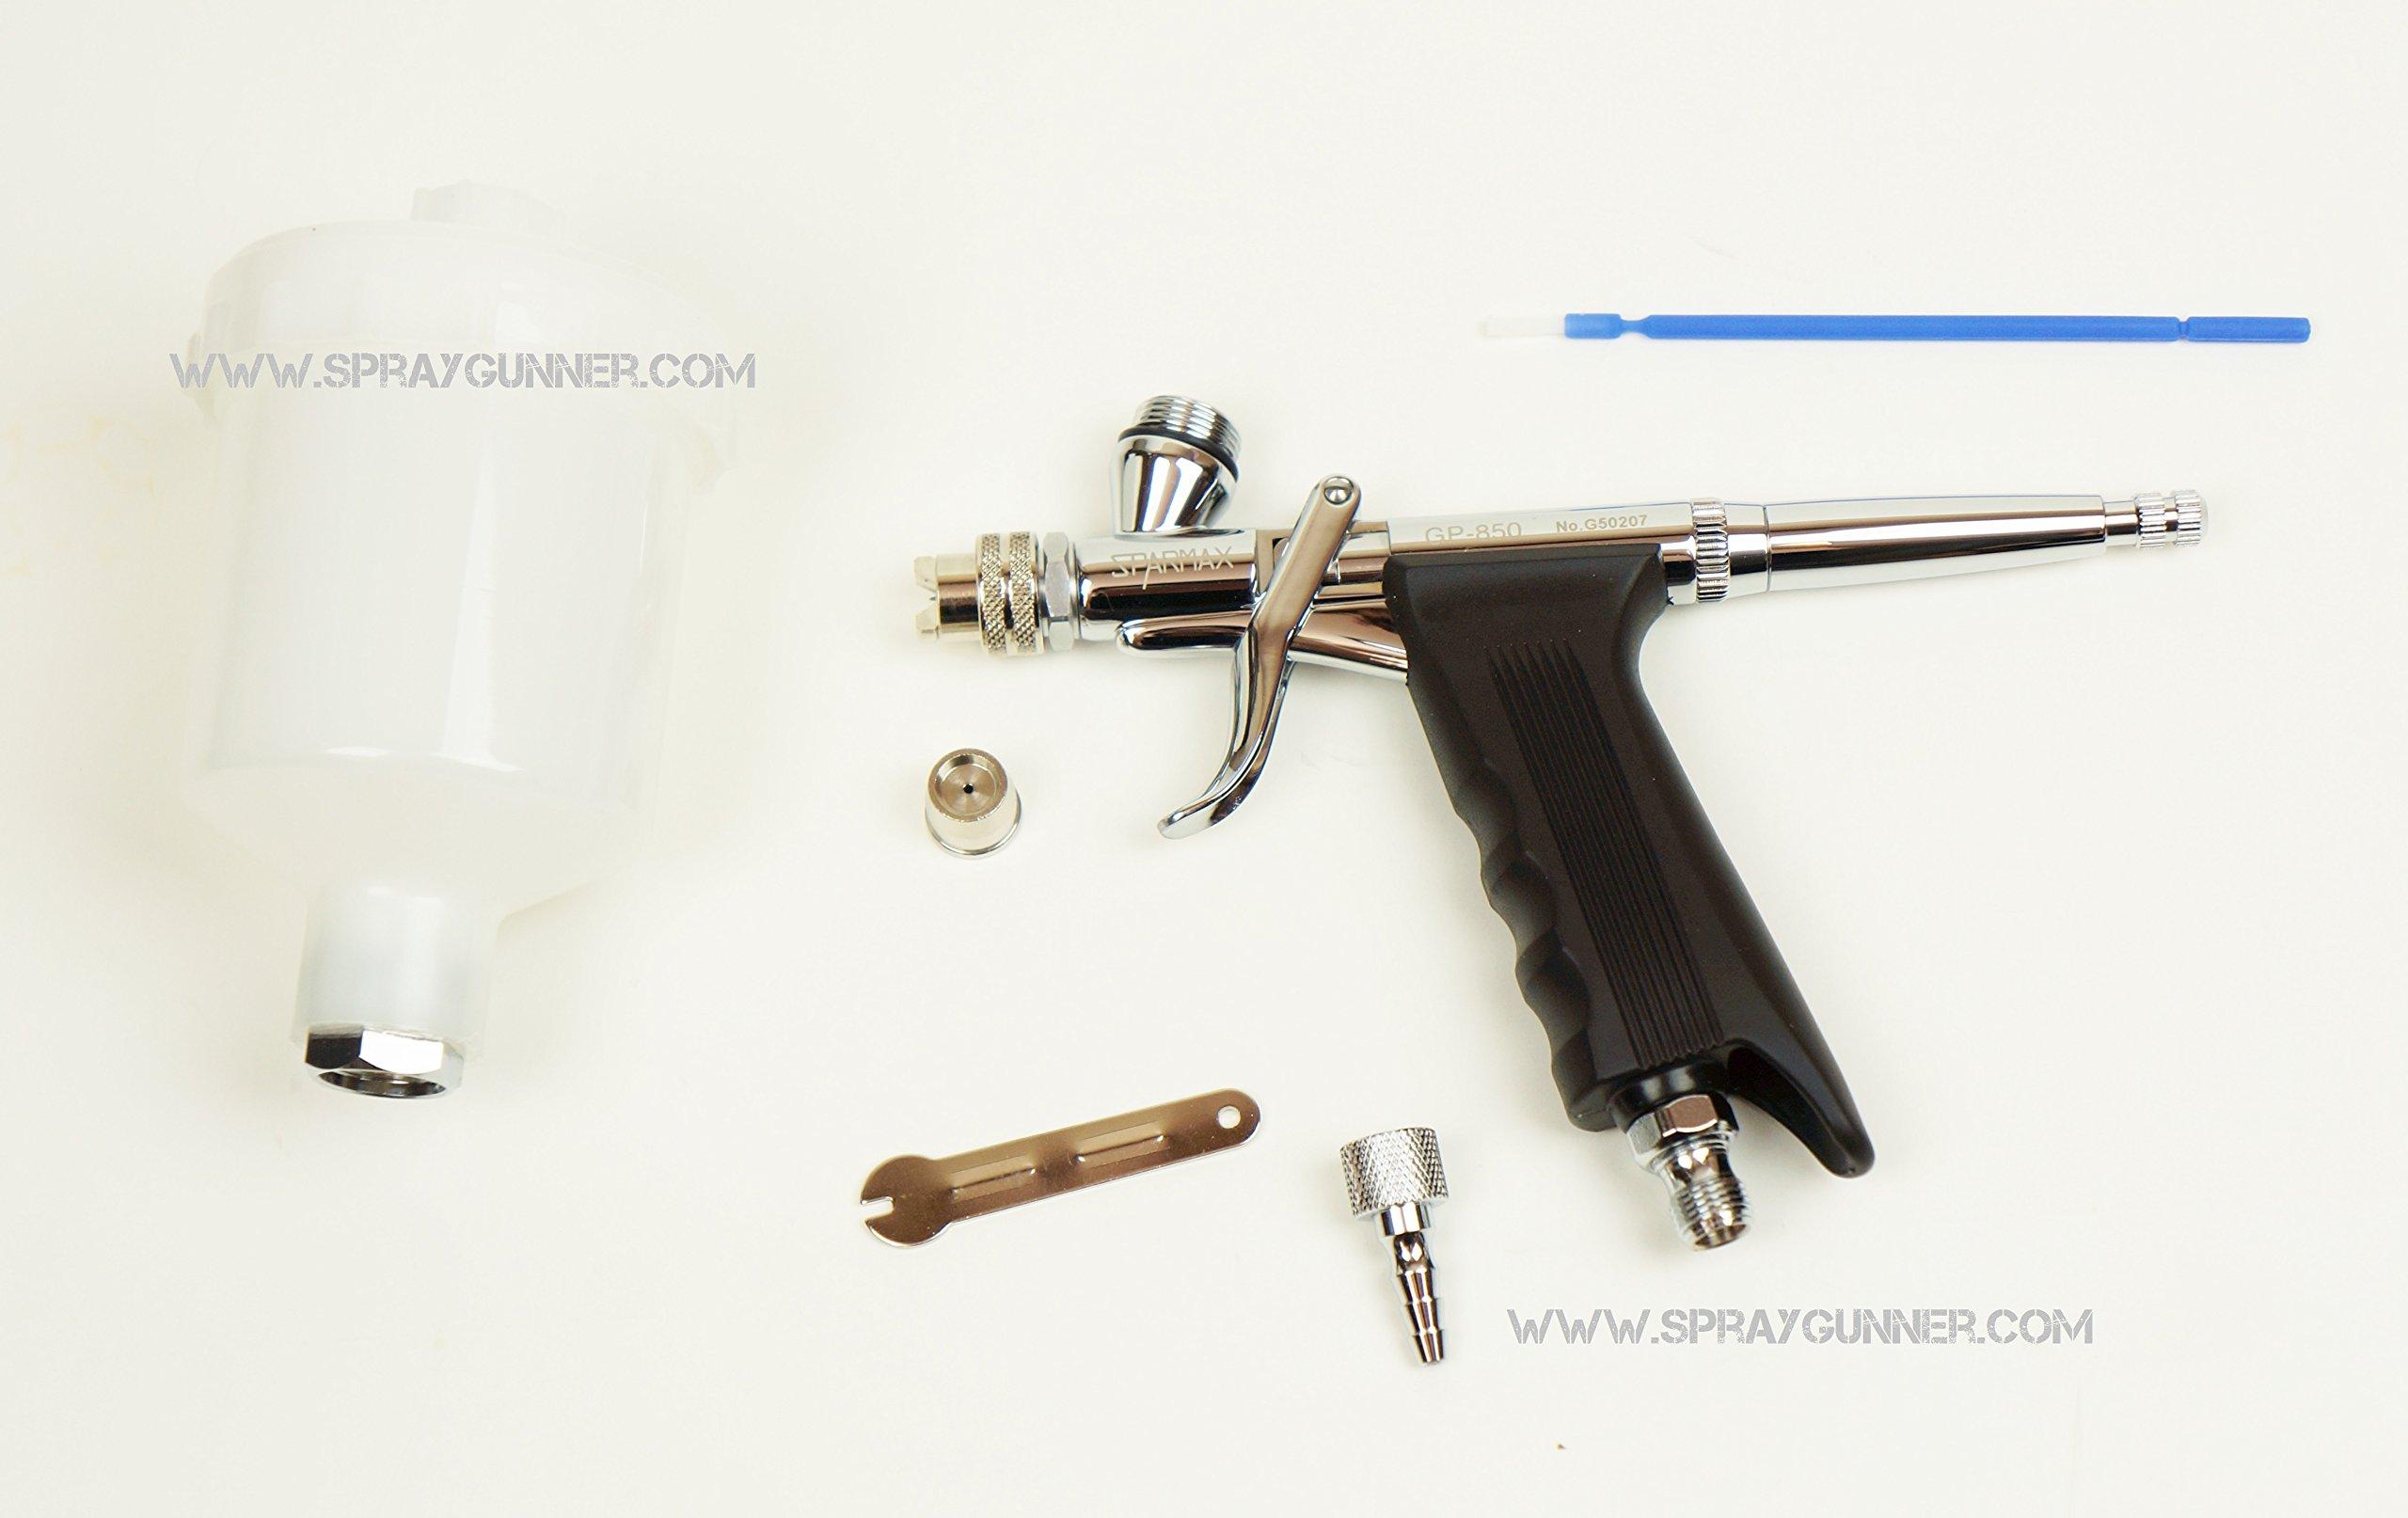 Spray Gun Airbrush Sparmax Pistol Grip Gp-850 gp850 0.5mm nozzle + BONUS by SprayGunner